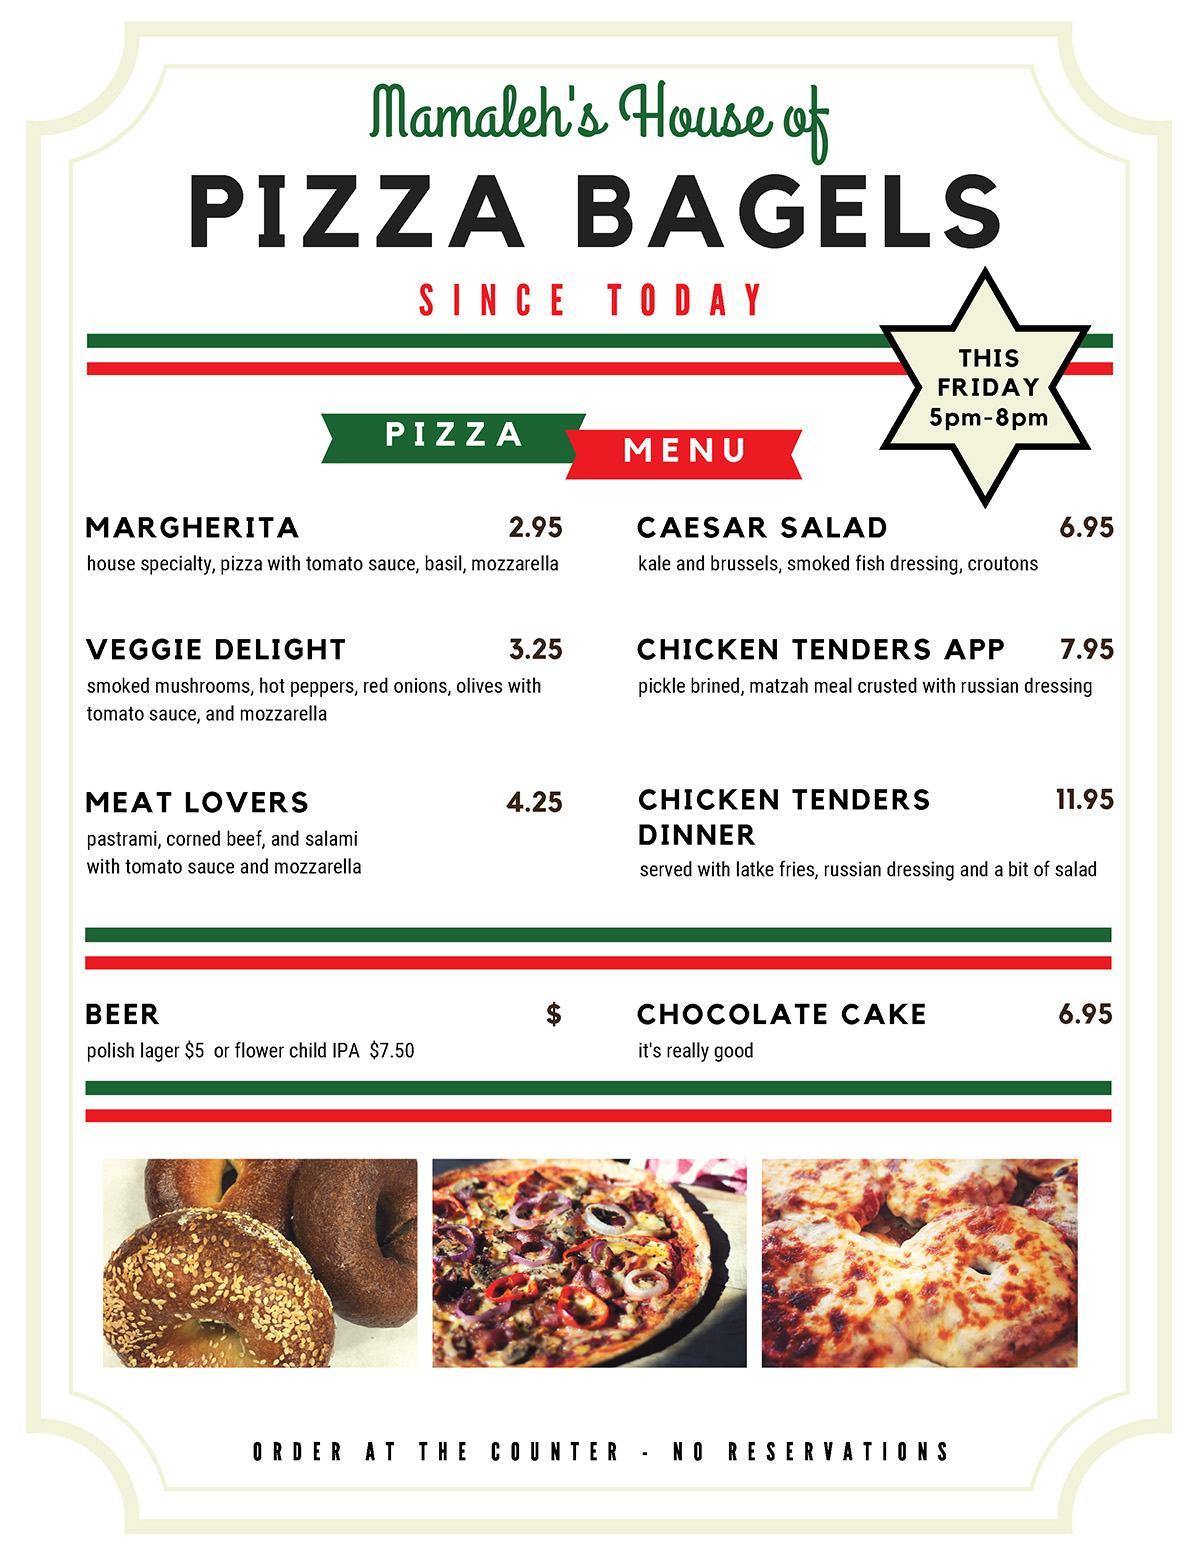 Mamaleh's House of Pizza Bagels menu